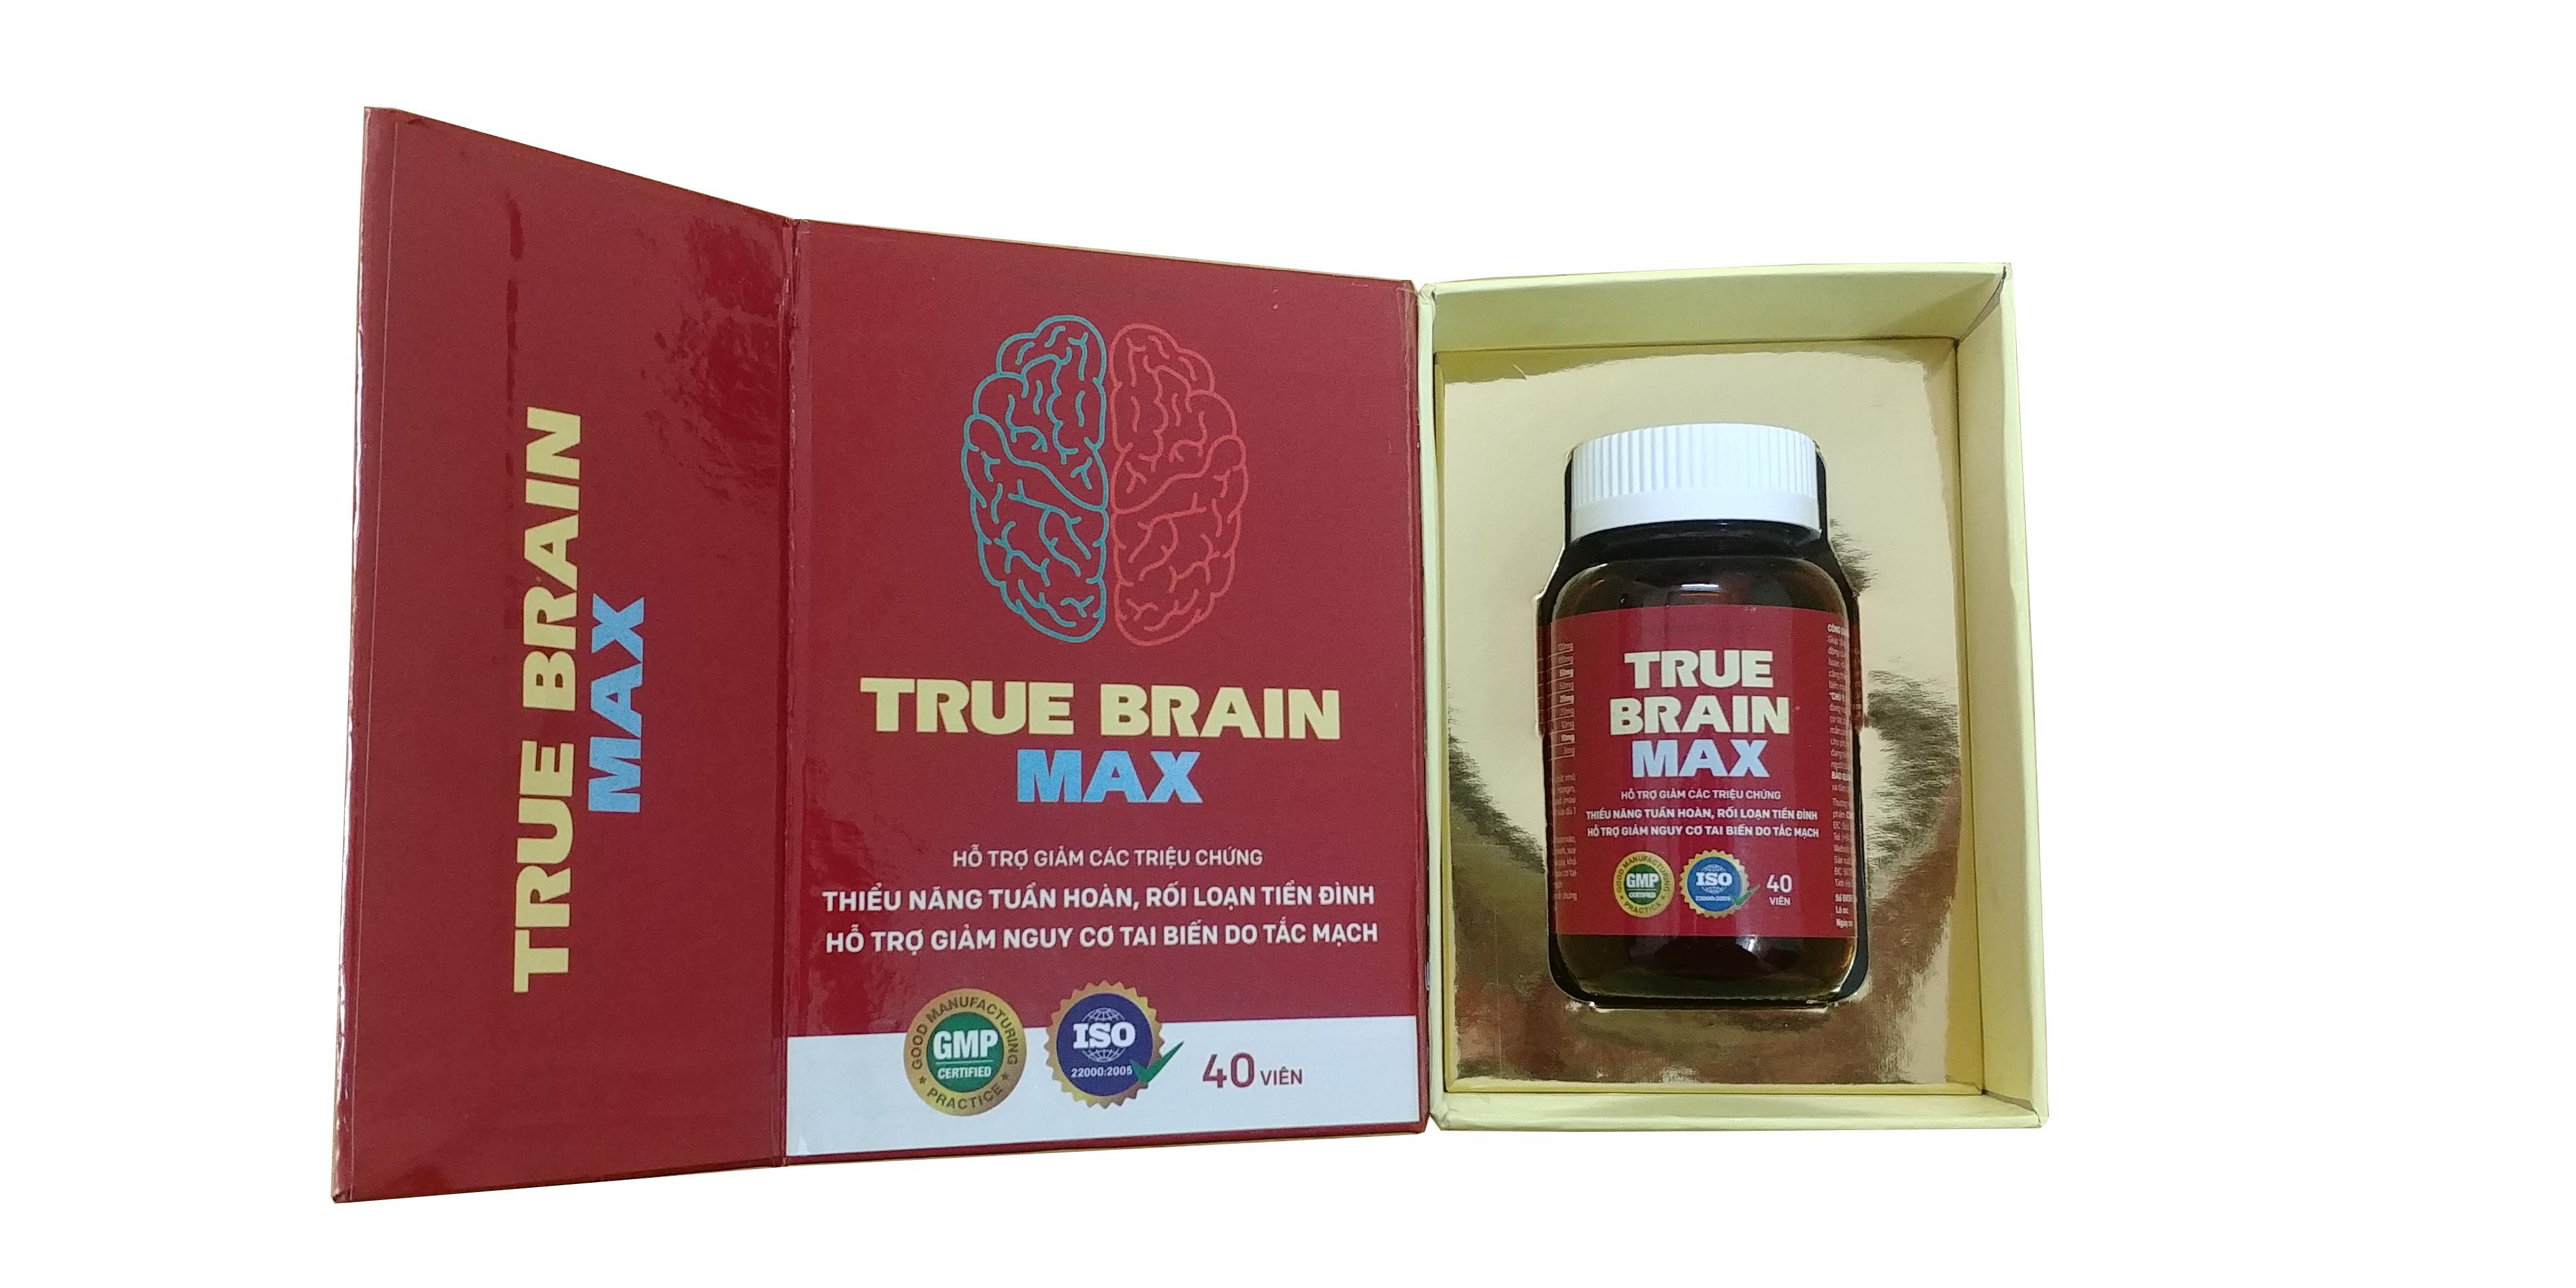 Truebrain max